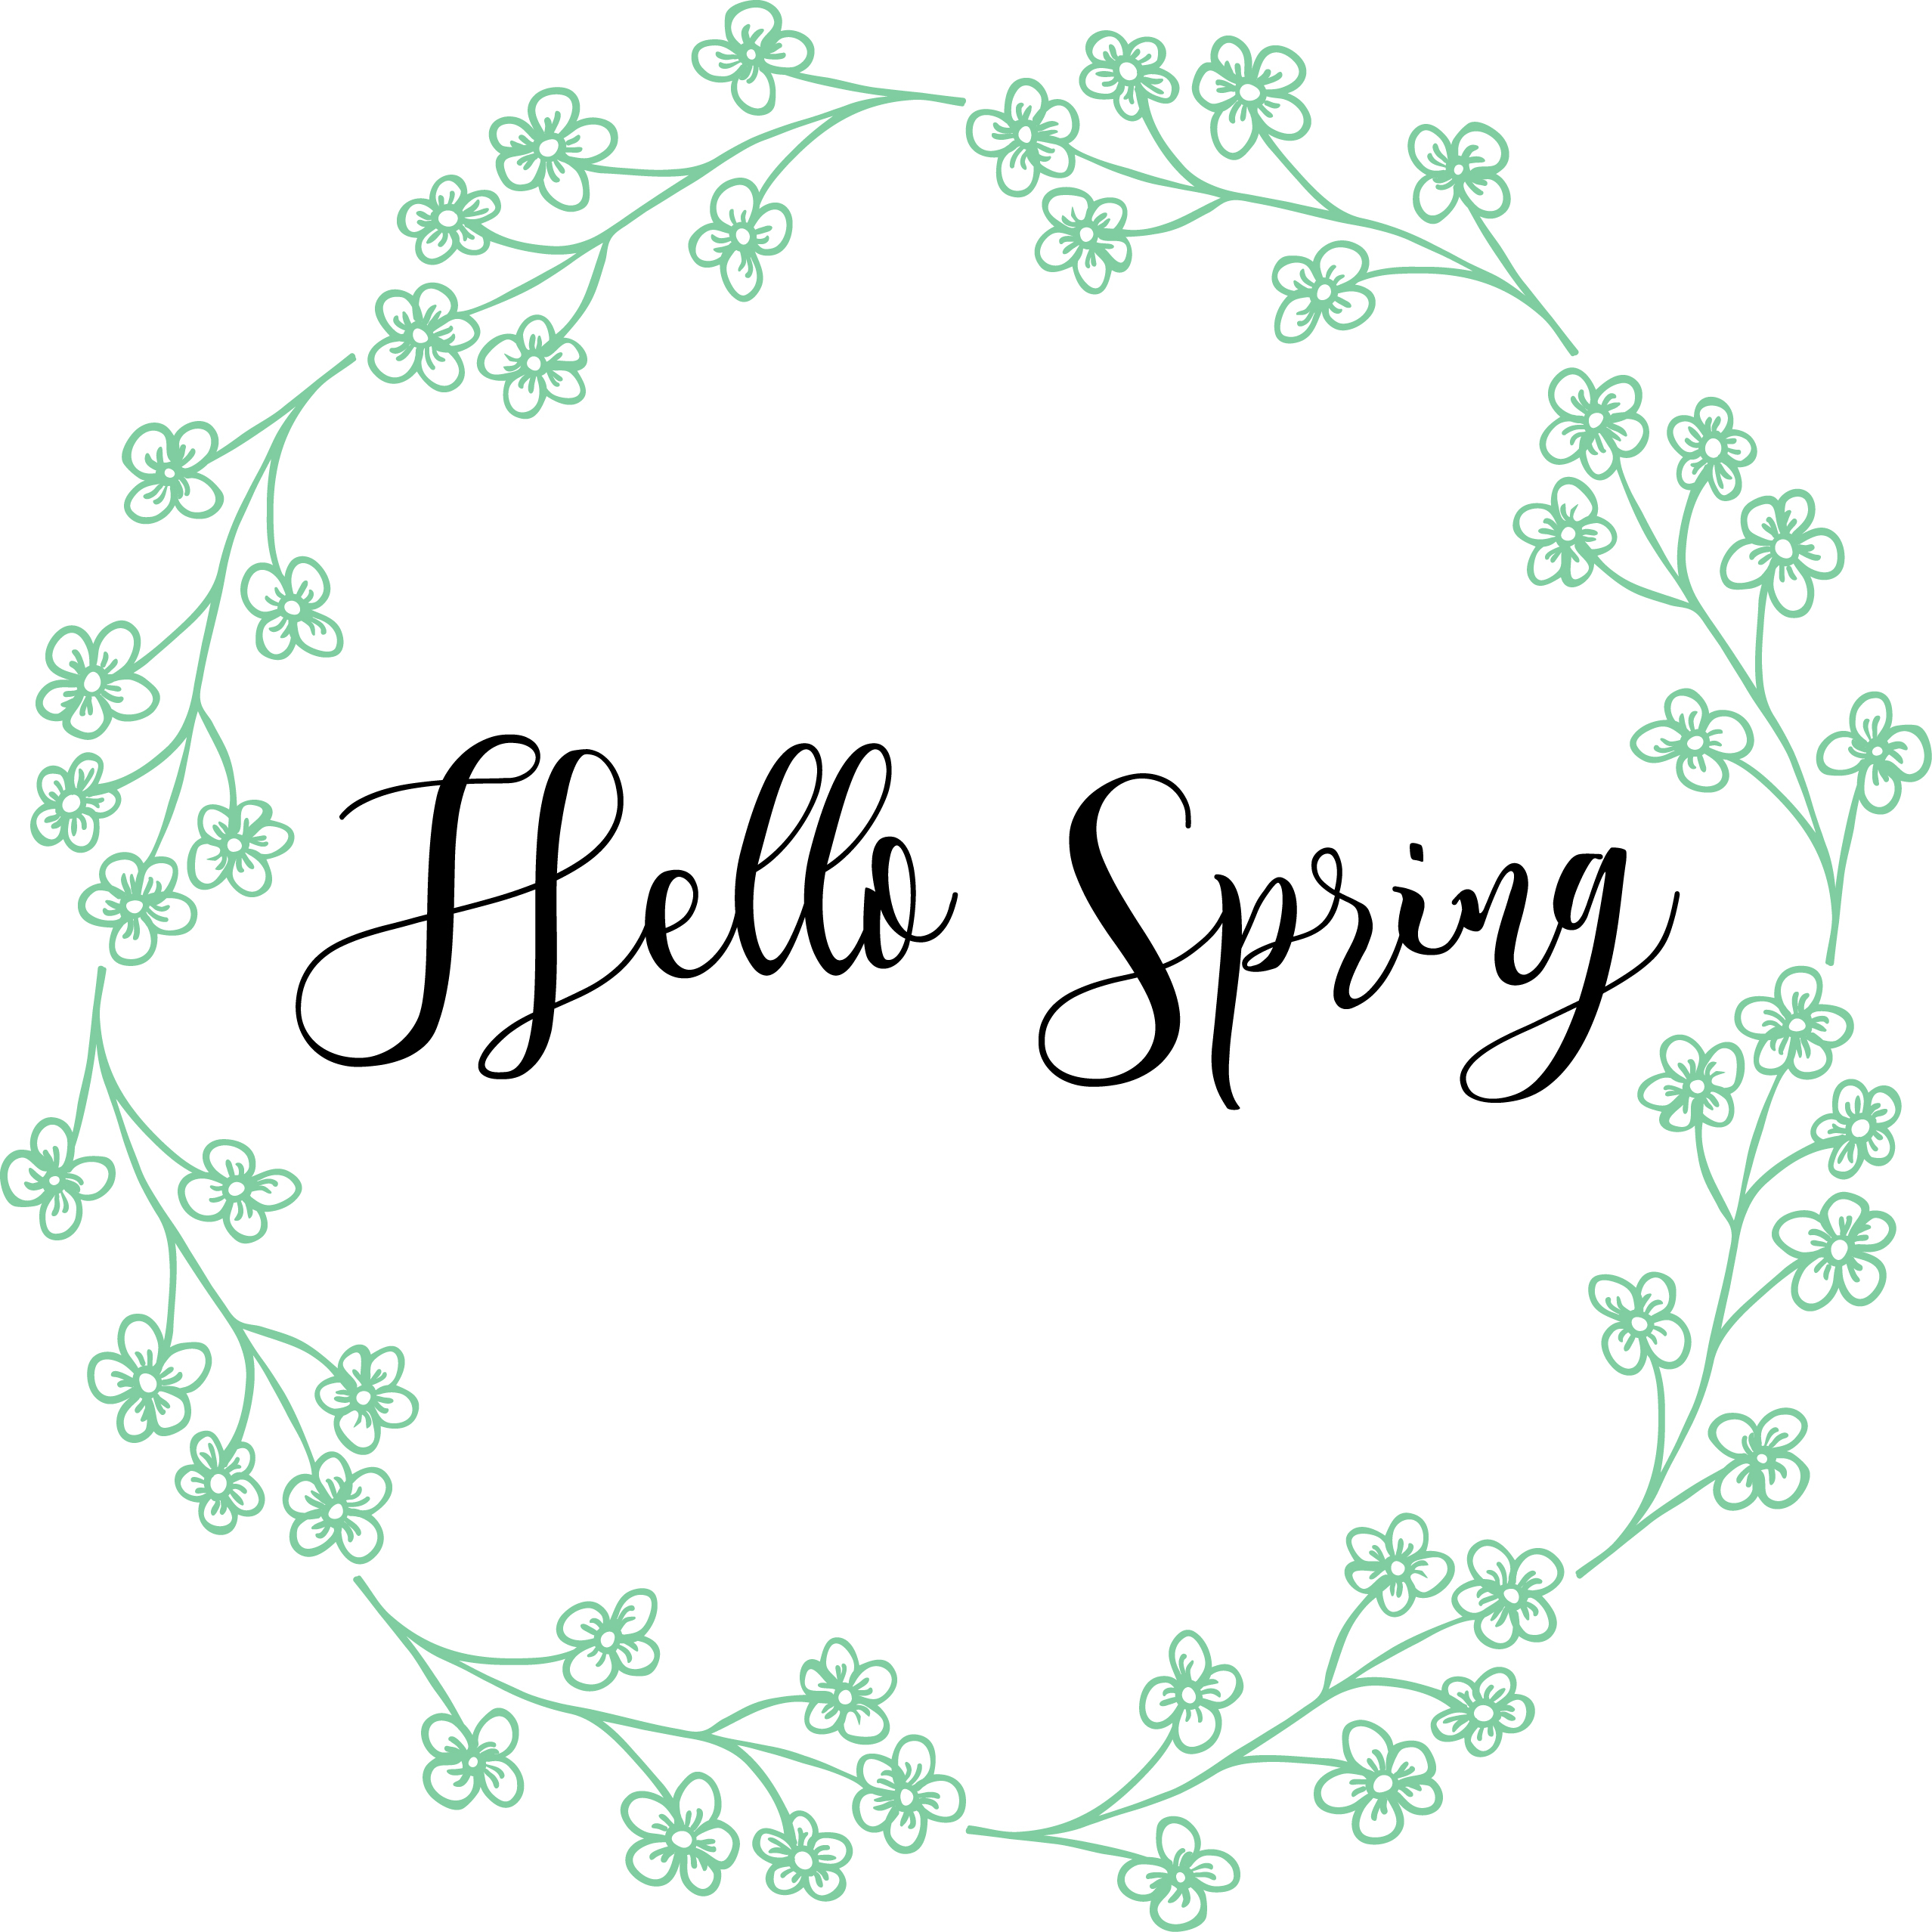 Free Spring Printables   Spring Decor   Nufun Activities - Free Printable Spring Decorations